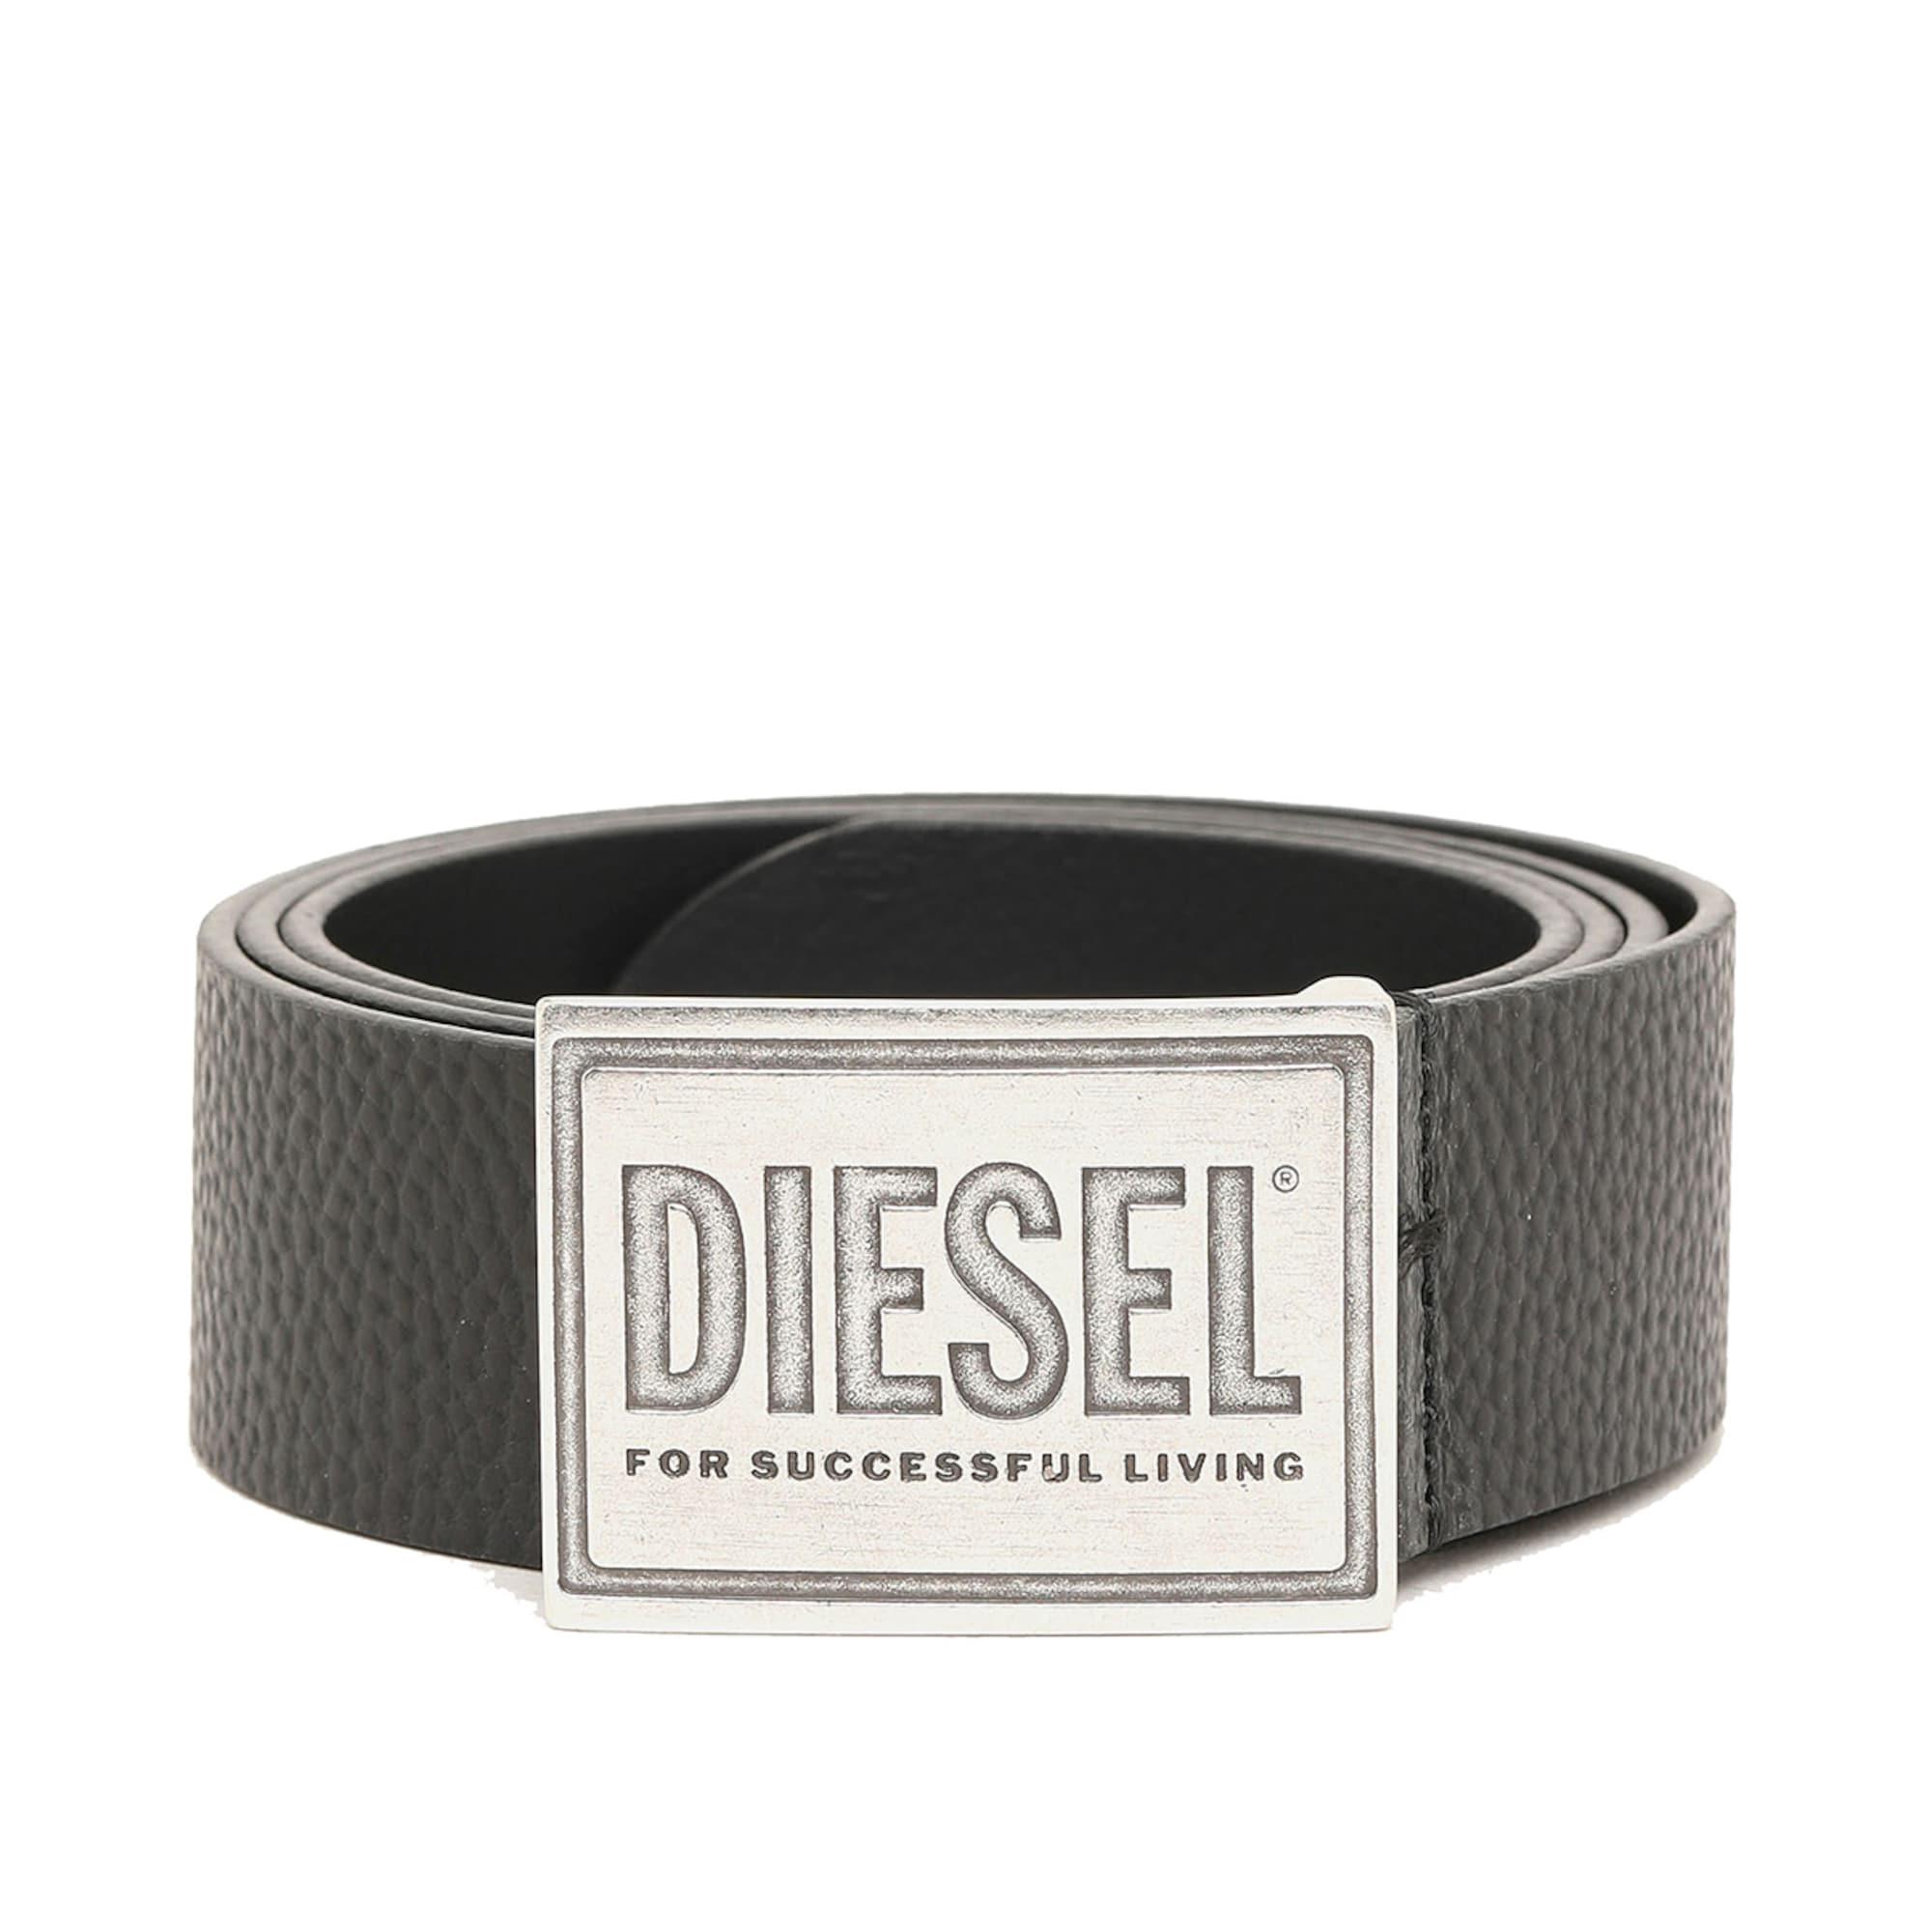 Diesel Ceinture 'B-GRAIN'  - Noir - Taille: 85 - male